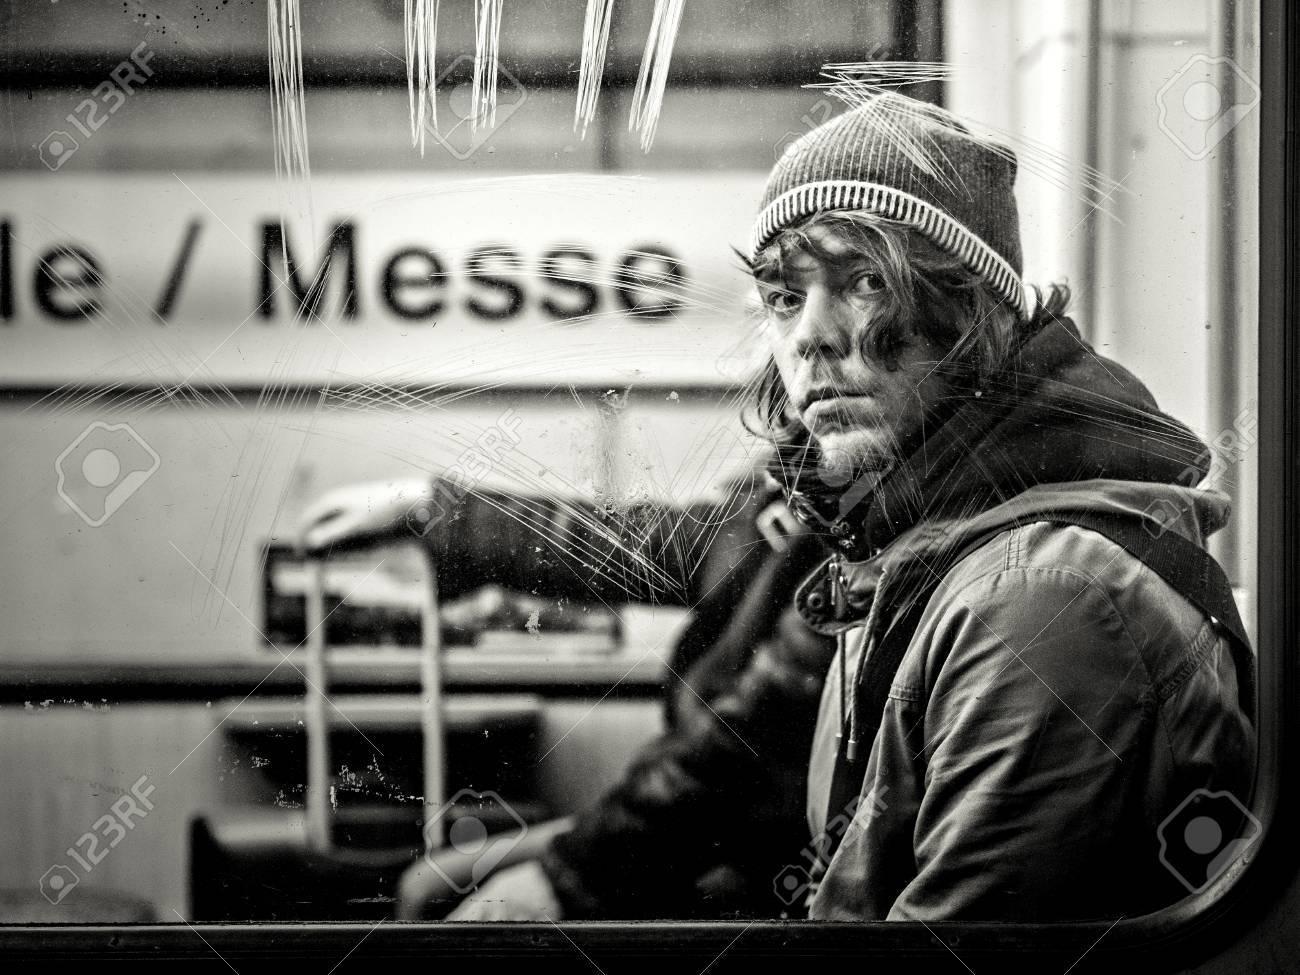 Frankfurt, Germany - January 09: Unidentified man in metro on January 09, 2015 in Frankfurt, Germany. Standard-Bild - 89297225